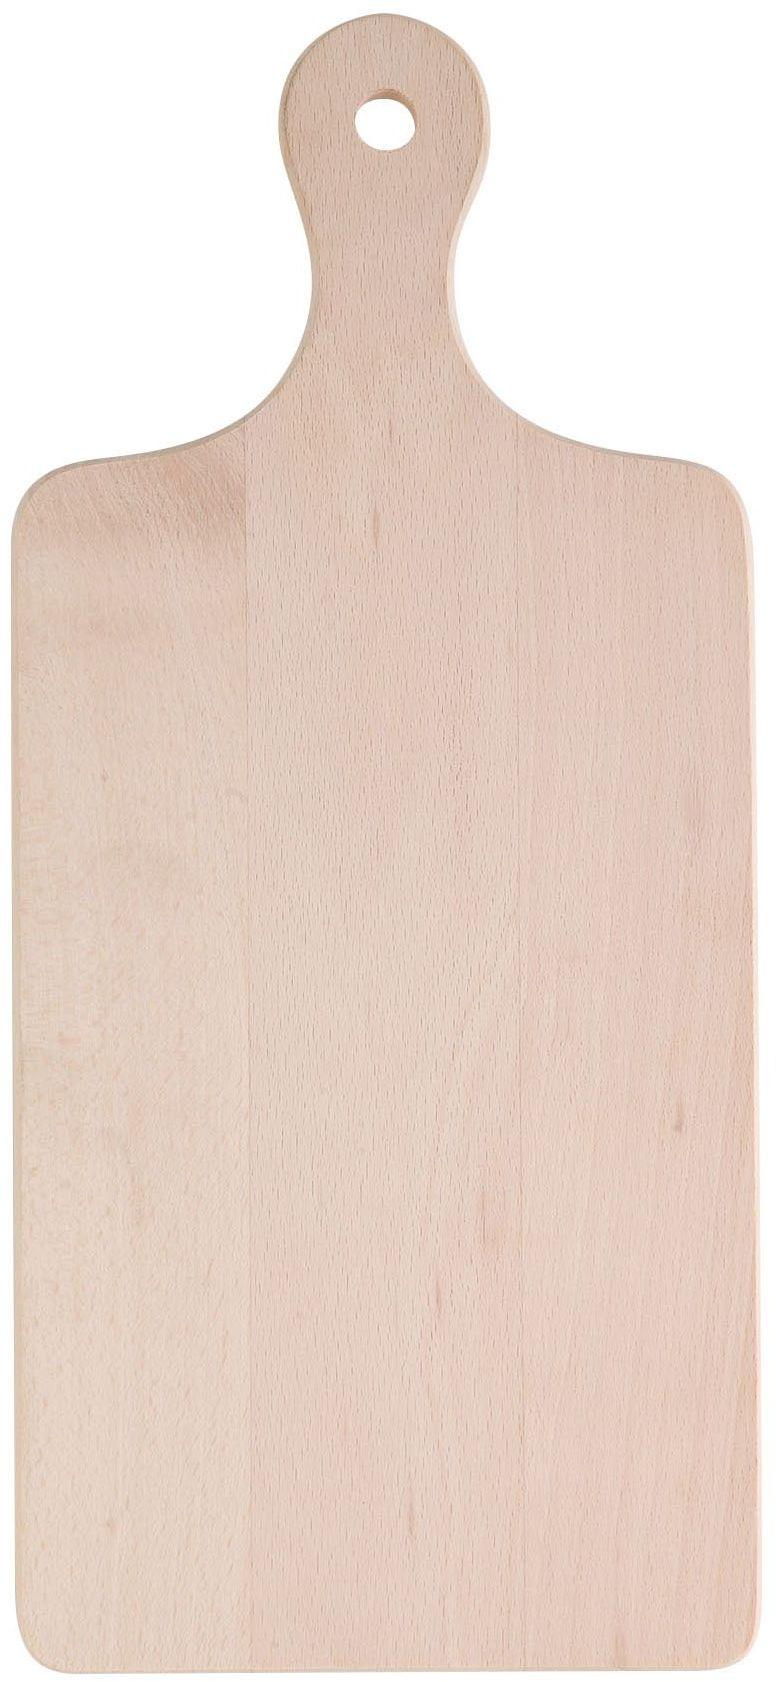 Eliplast 608/1 deska do krojenia drewna, 170 x 390 x 15 mm, szara